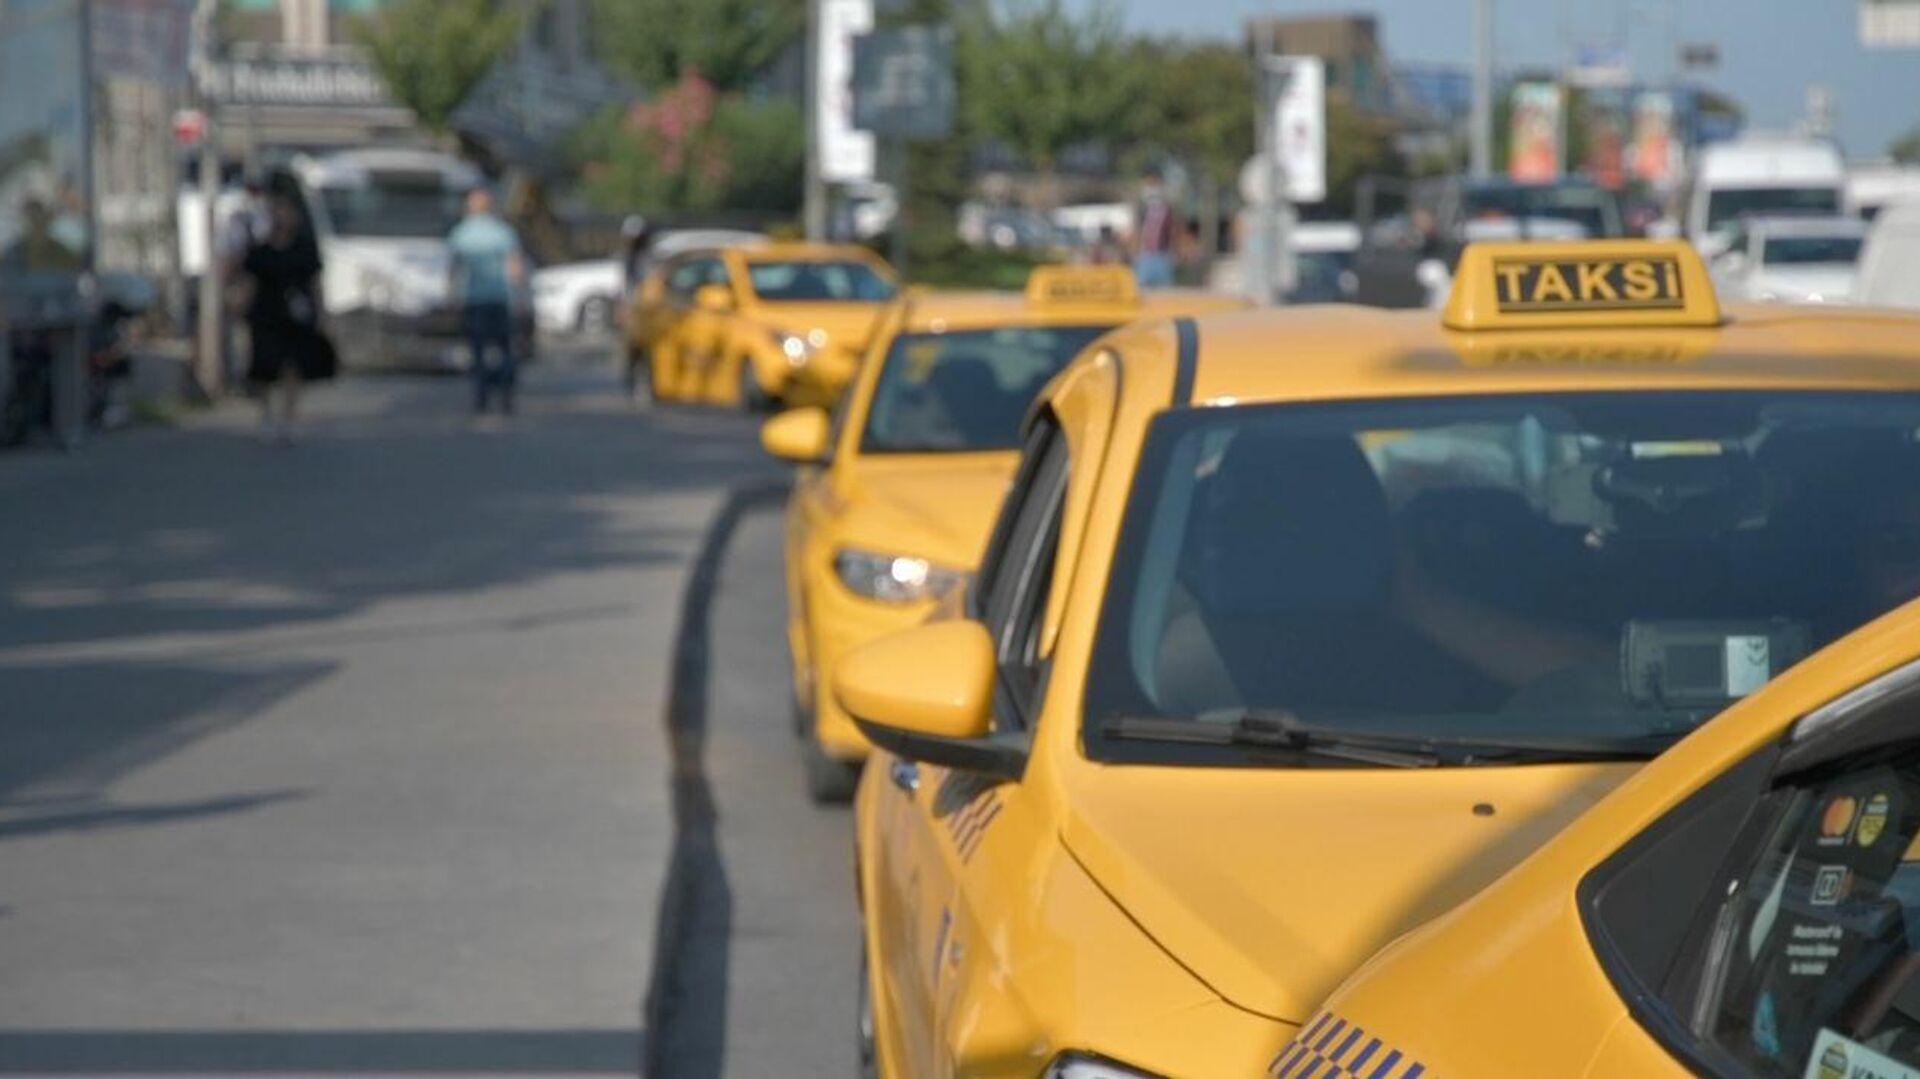 Taksi, taksici - Sputnik Türkiye, 1920, 15.09.2021